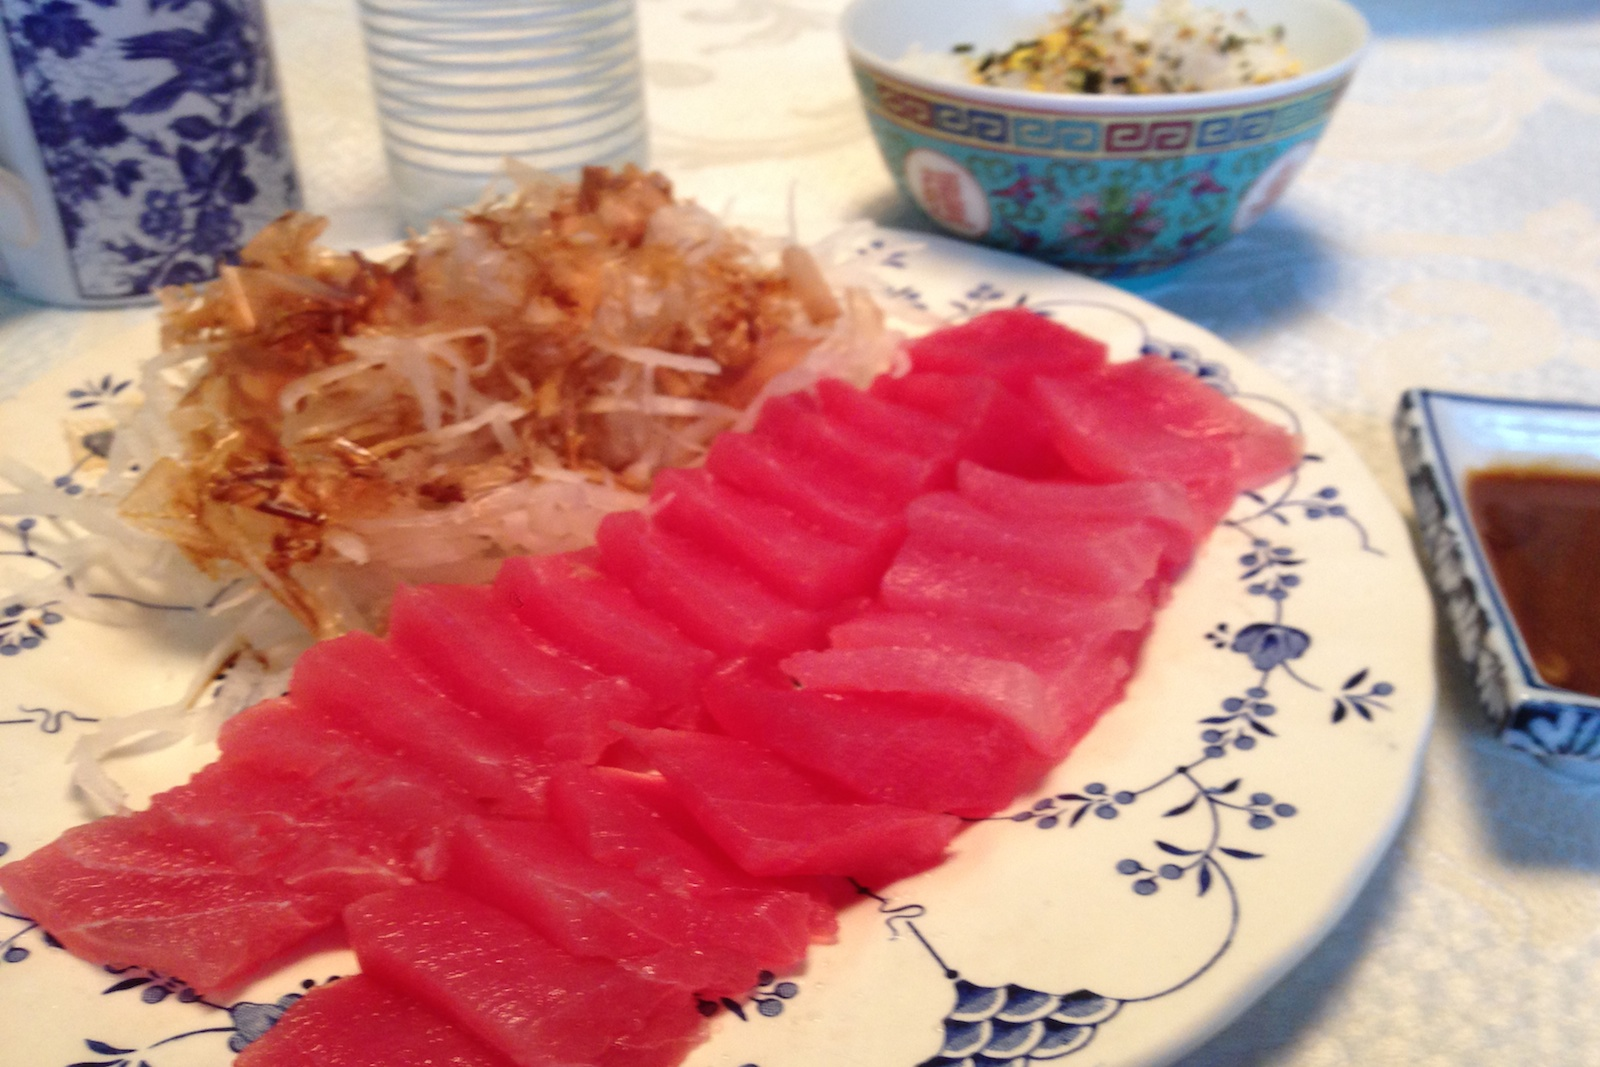 http://blog.rickk.com/food/2014/08/31/ate.2014.08.31.l.jpg